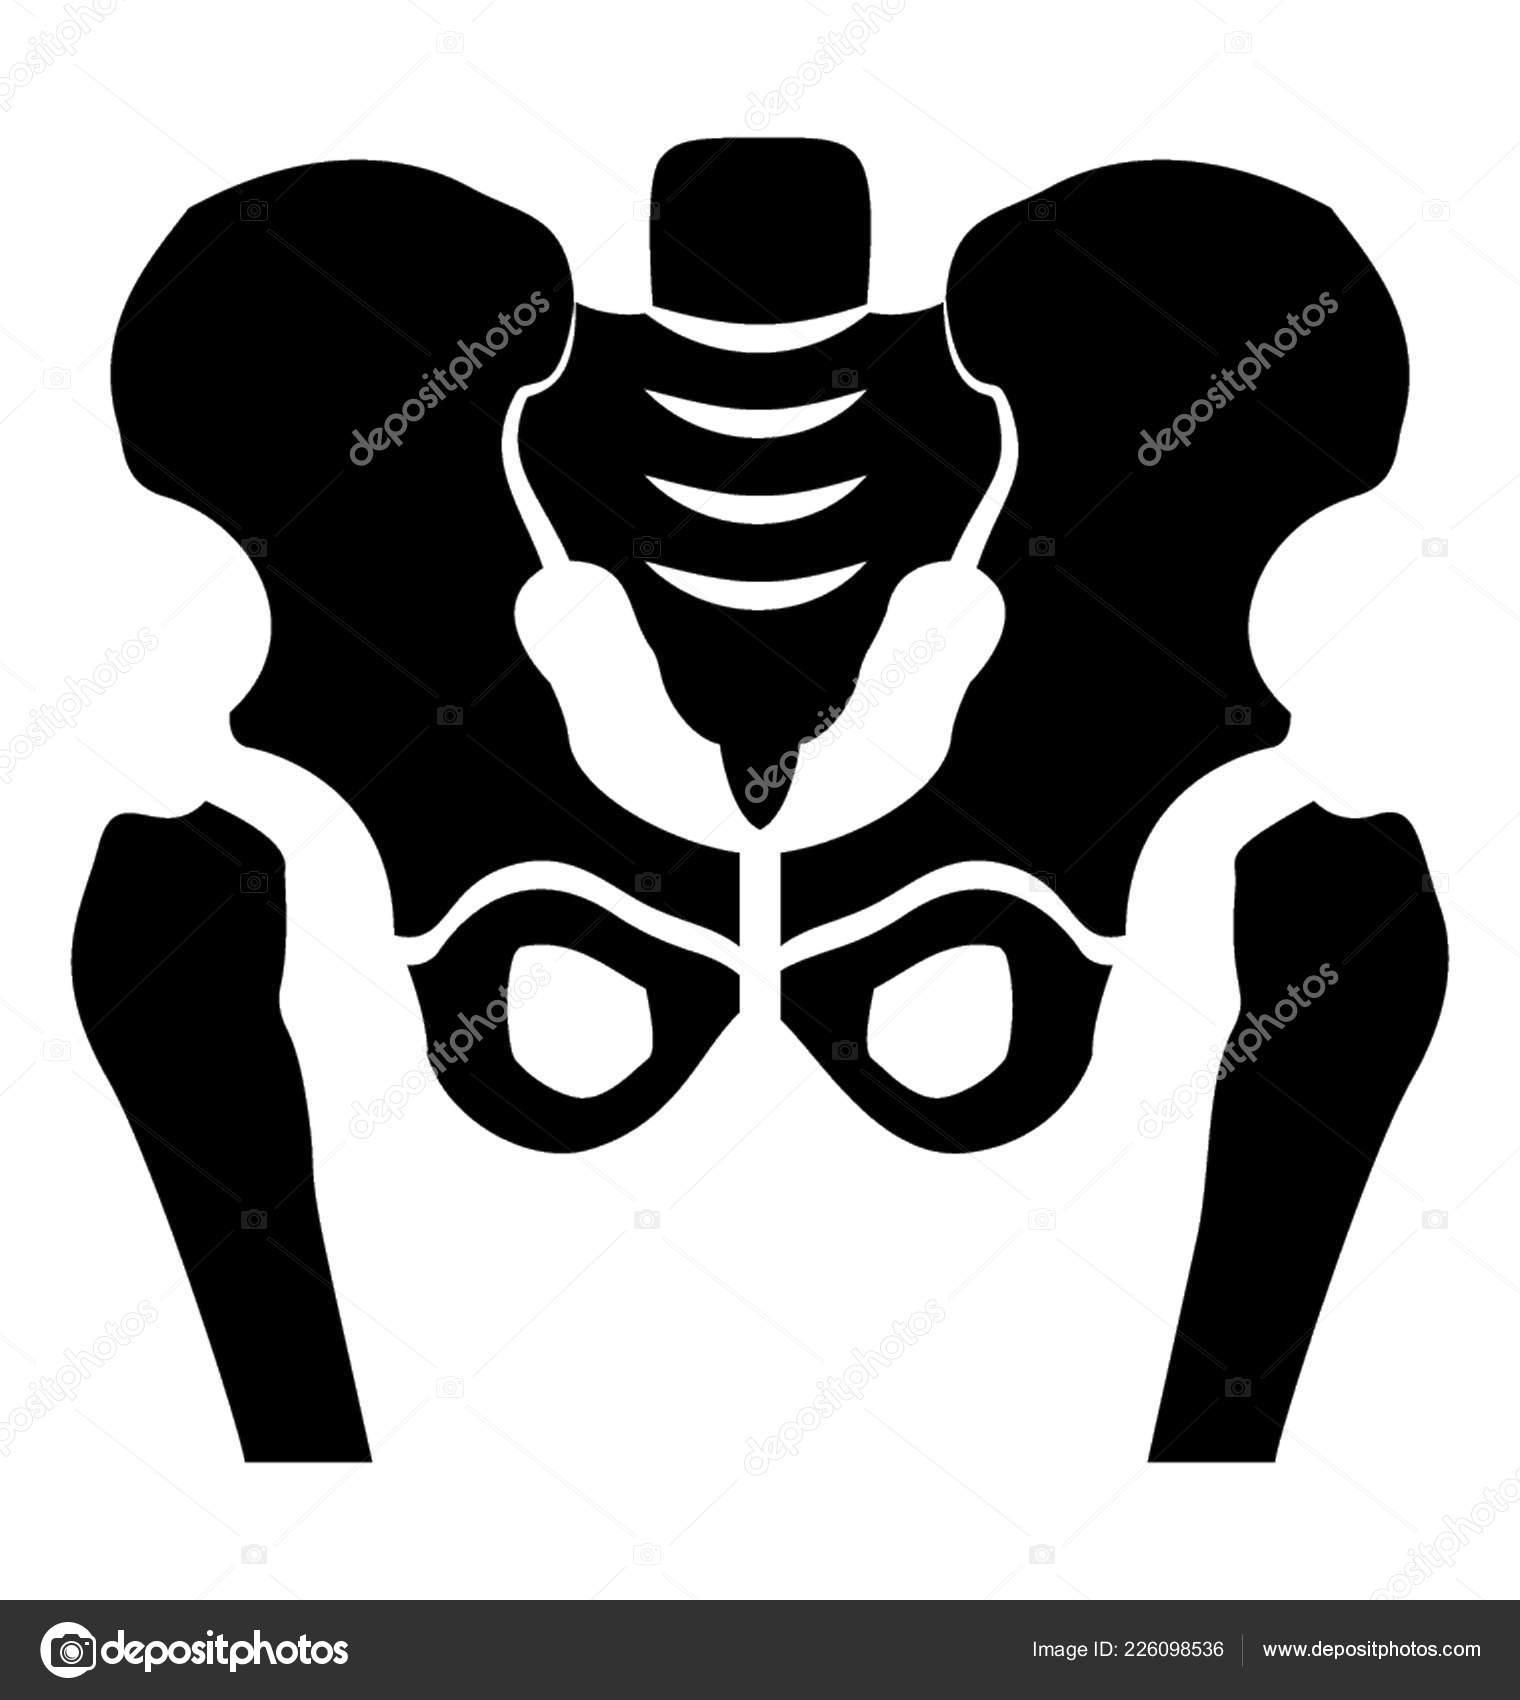 Conception Squelette Solide Icône Bassin Image Vectorielle